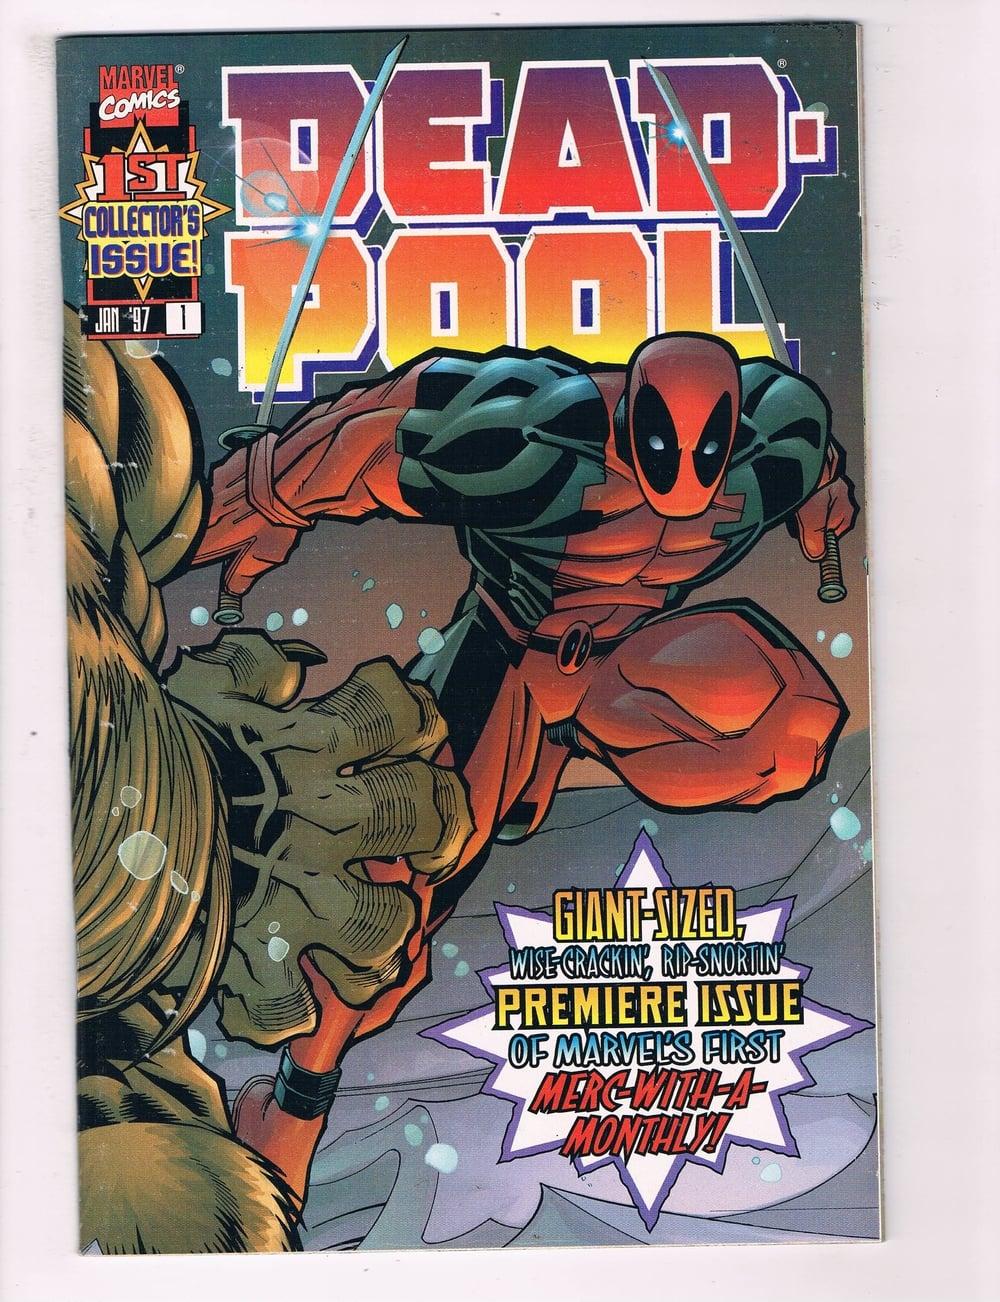 Deadpool1.JPG